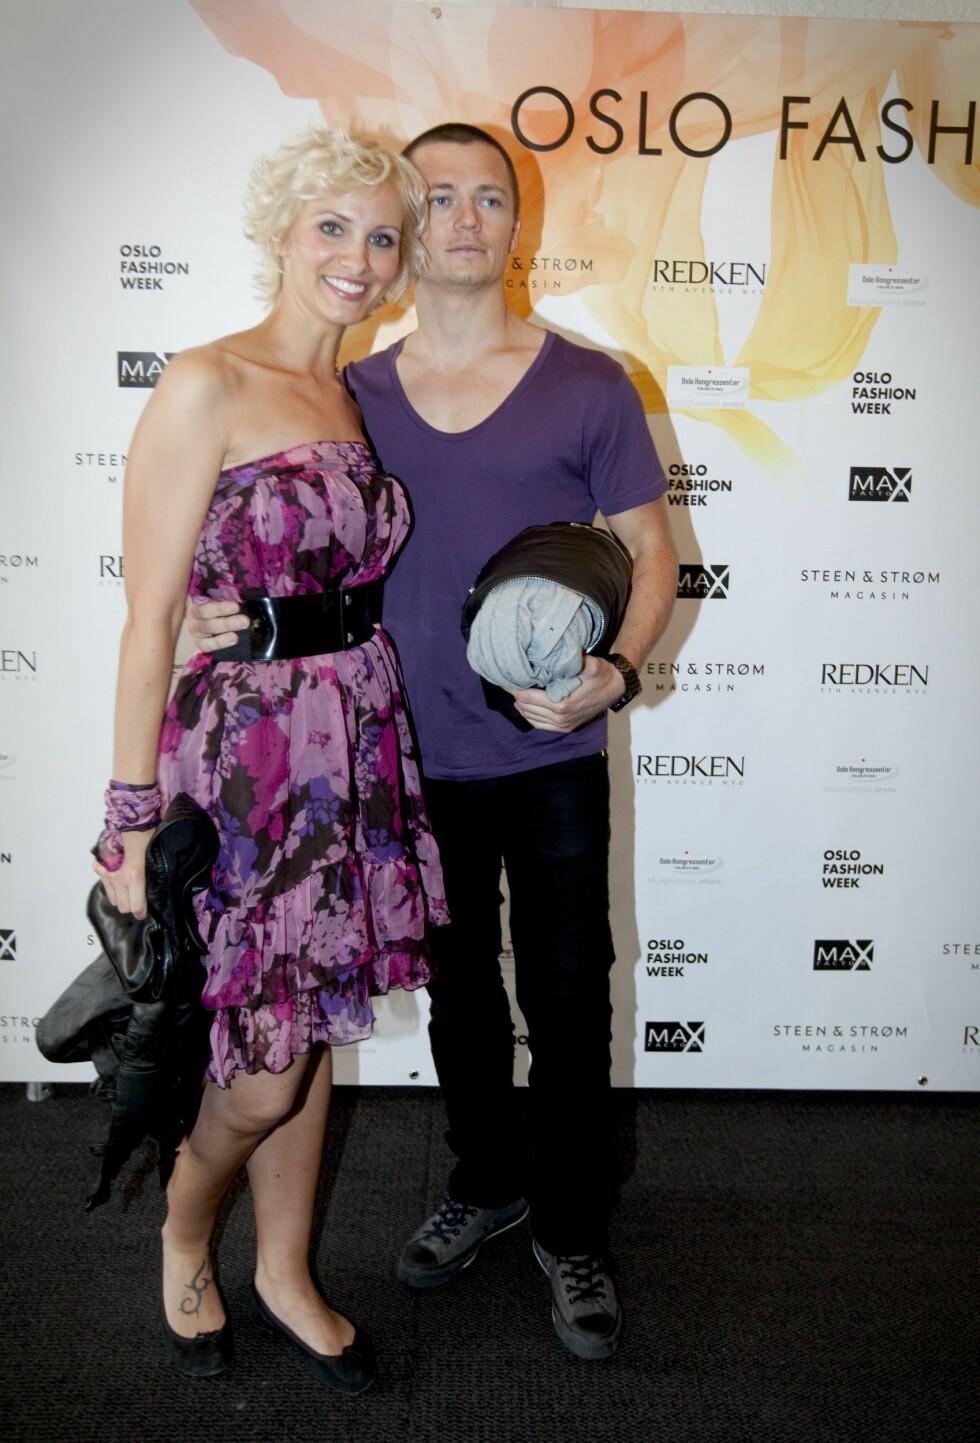 <strong>STØDIG PAR:</strong> Anne Rimmen og Ailo Gaup har vært et par siden 2008. Her er turtelduene under Oslo Fashion Week året etter de ble sammen.  Foto: NTB scanpix